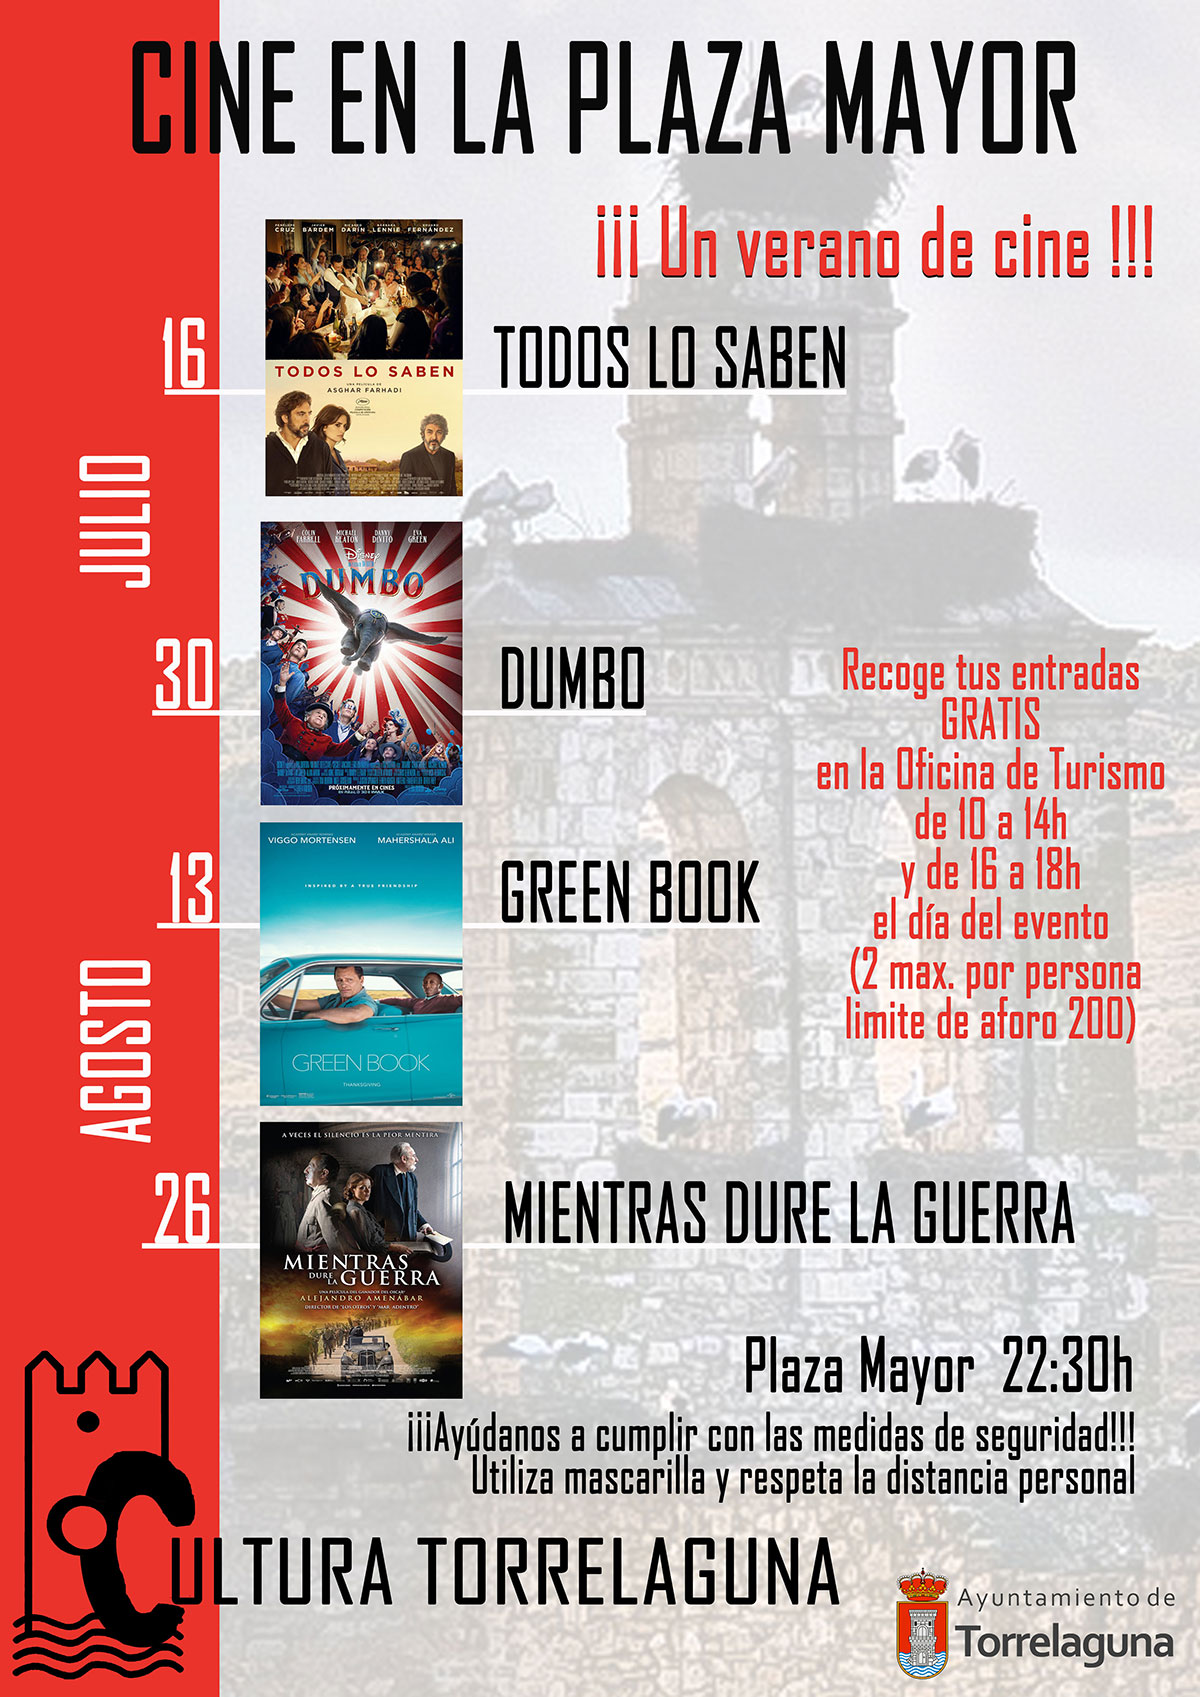 Cine en la Plaza Mayor de Torrelaguna